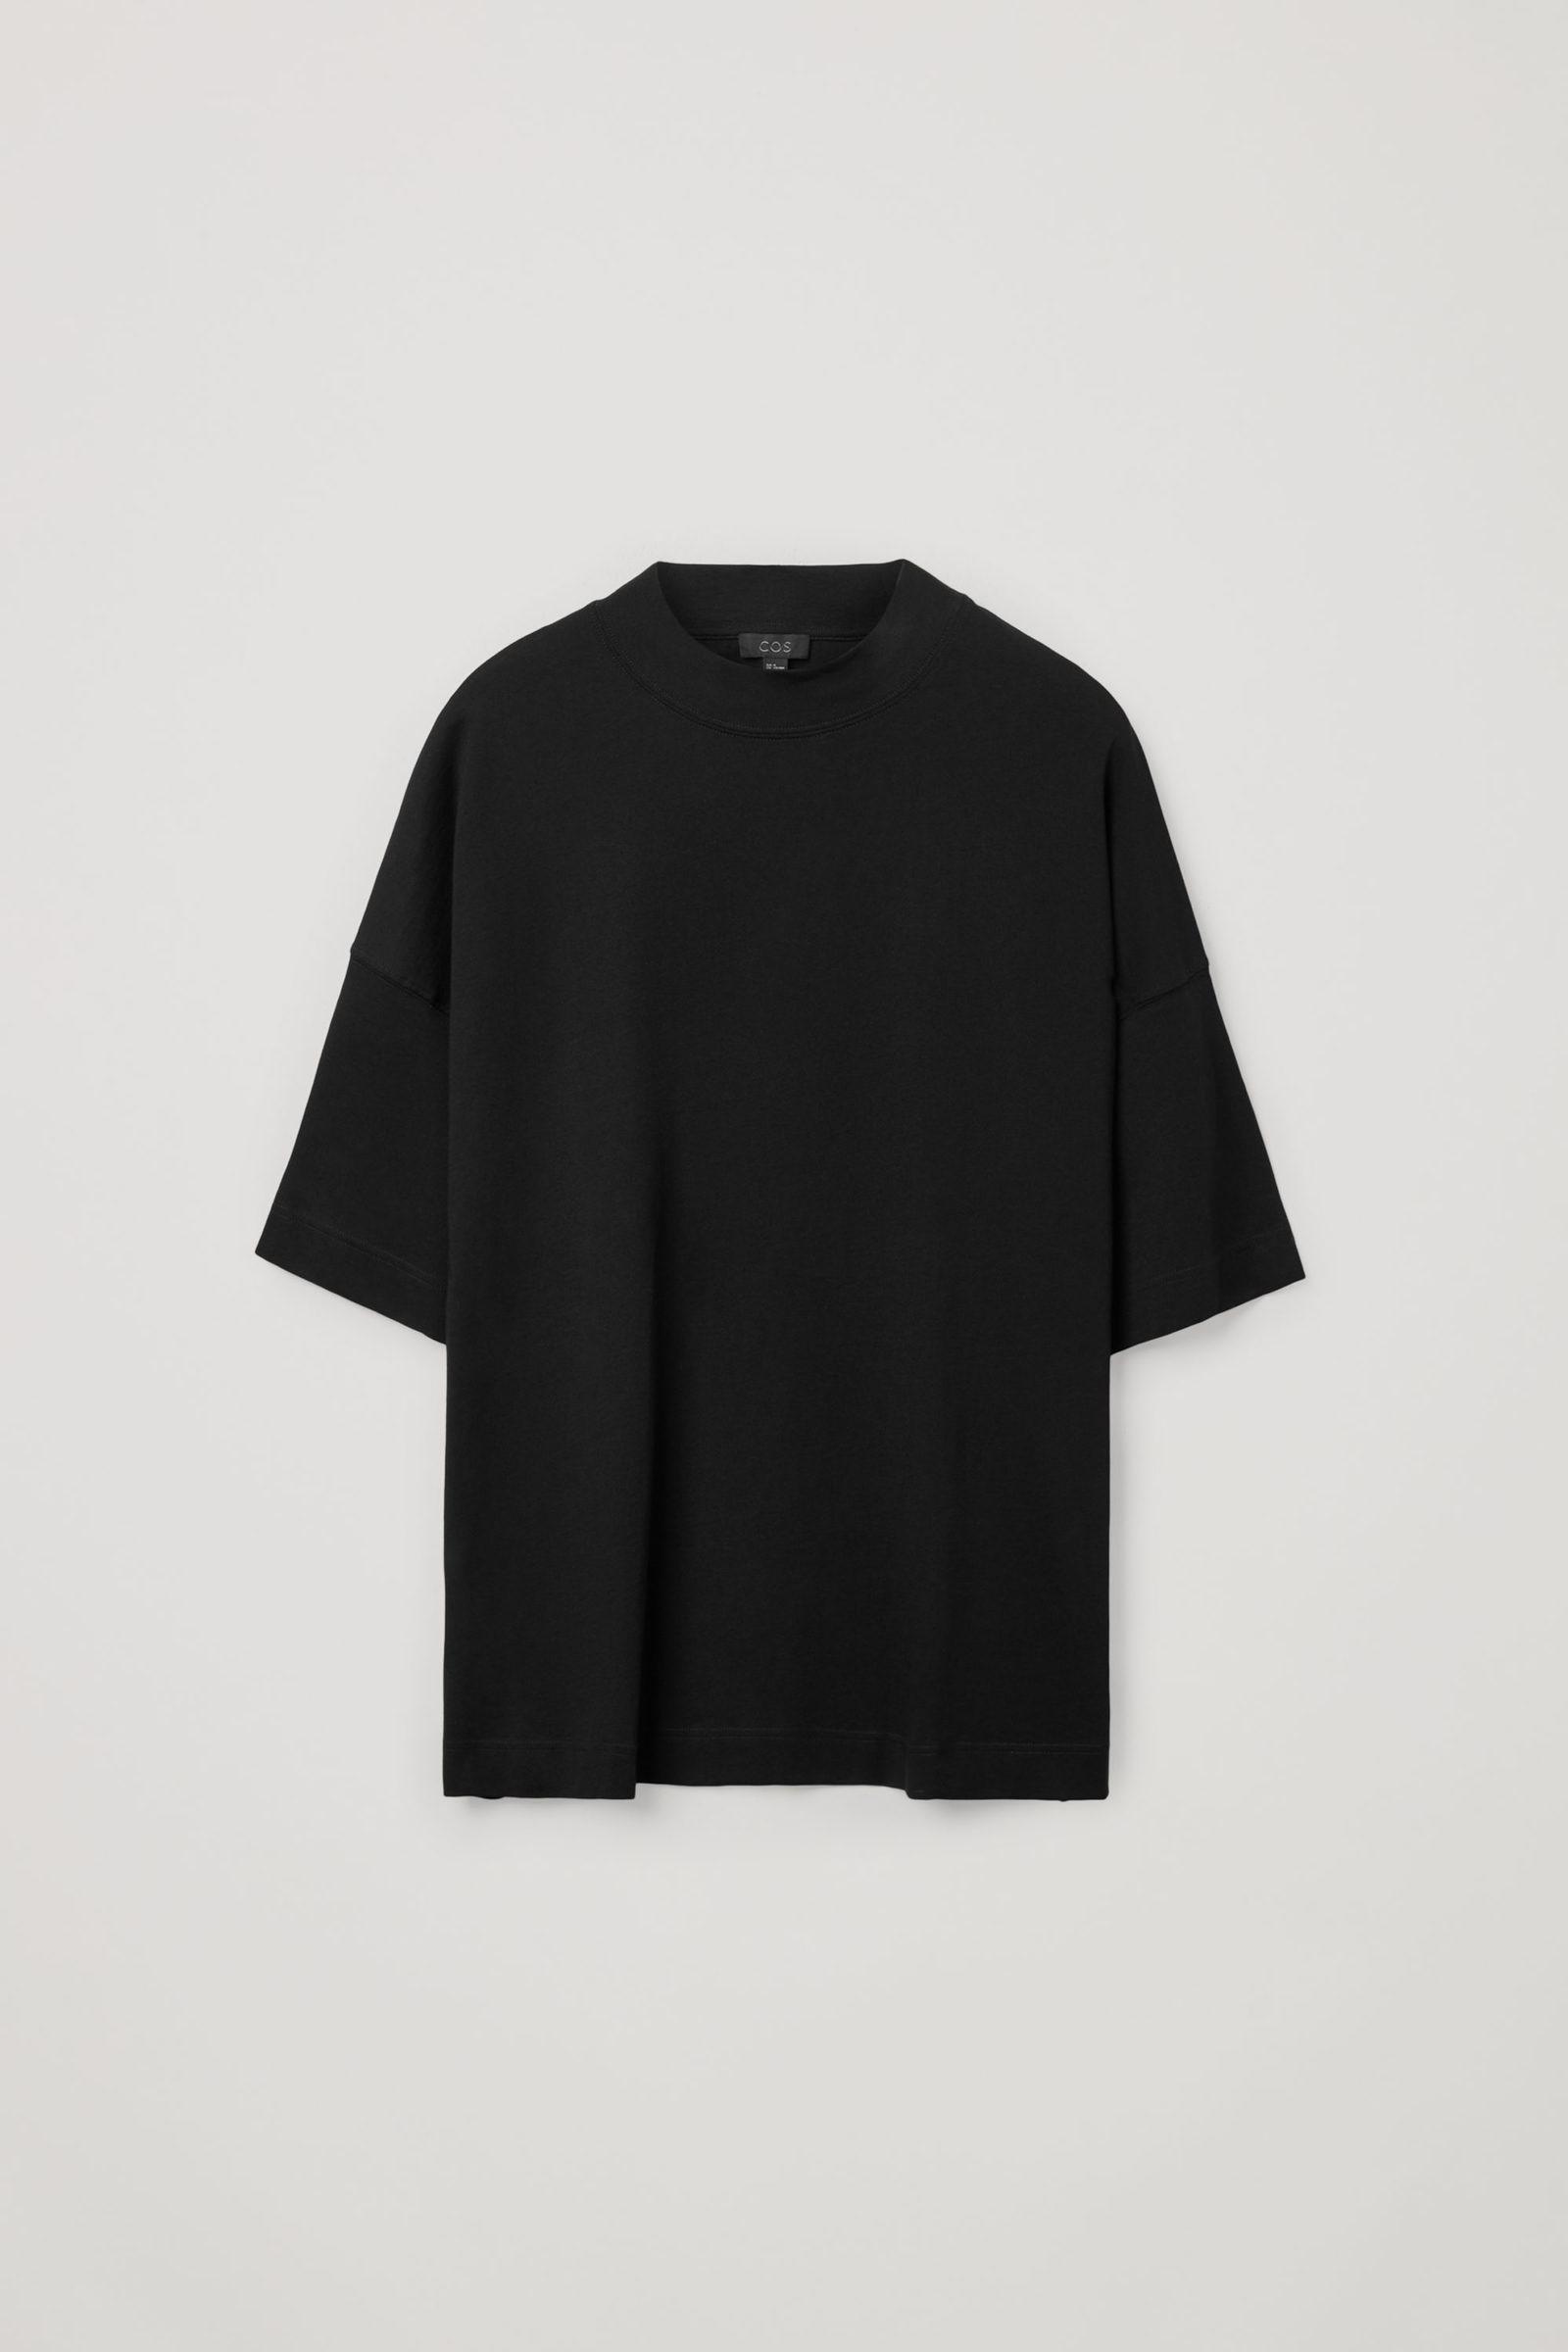 COS 오버사이즈 박시 코튼 티셔츠의 블랙컬러 Product입니다.